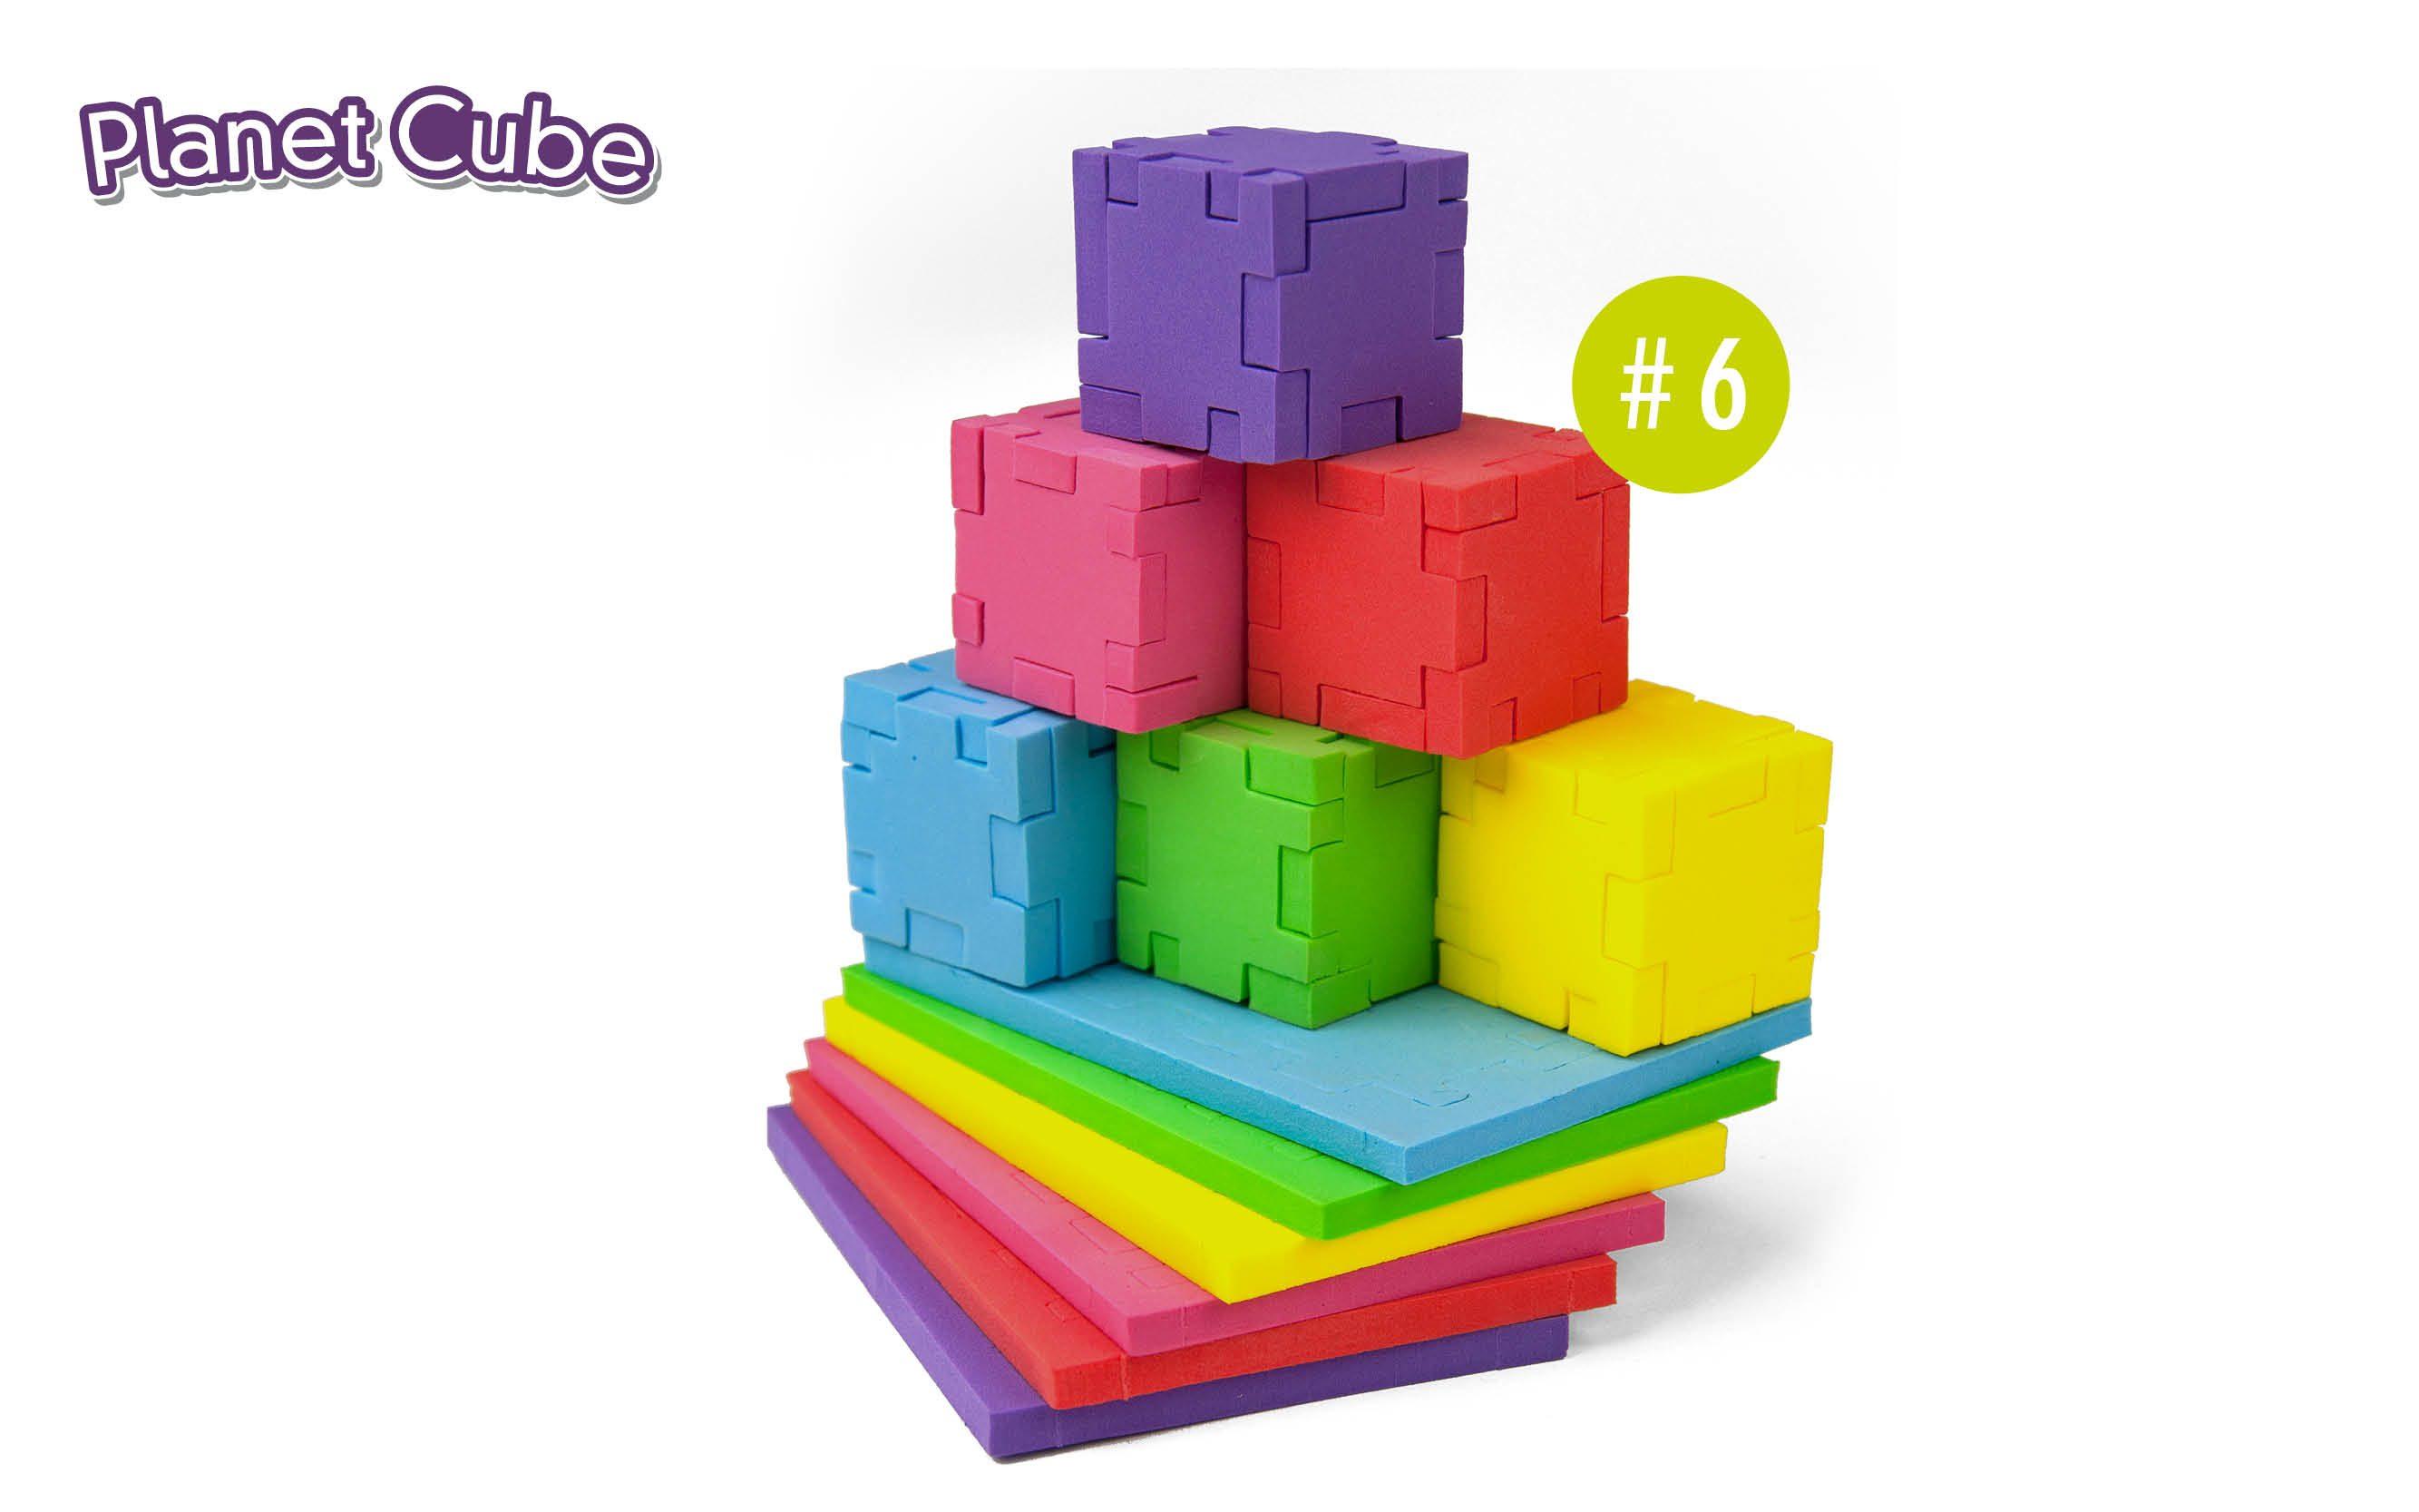 Happy_PlanetCube_6_foam_cubes